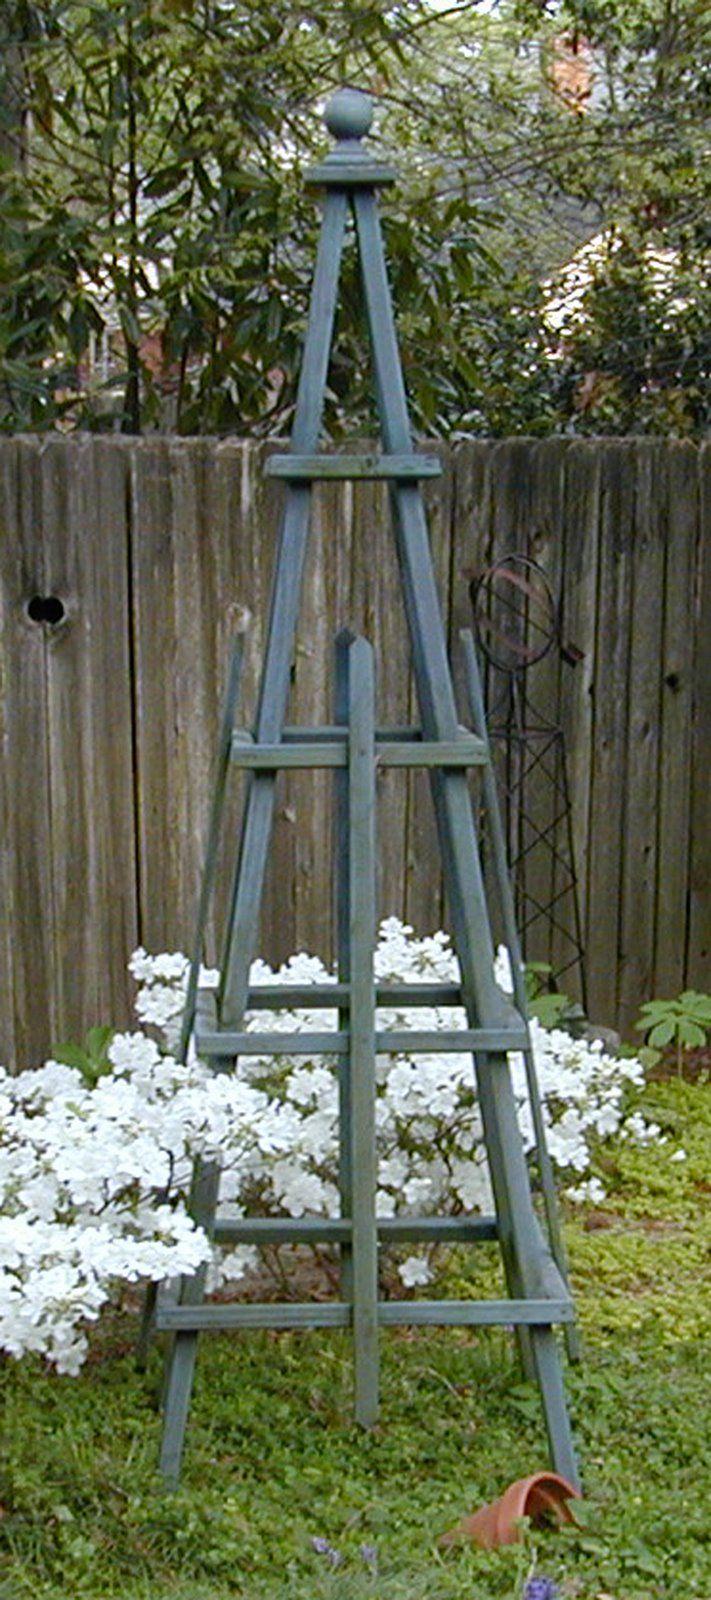 Tuteur Garden obelisk, Garden structures